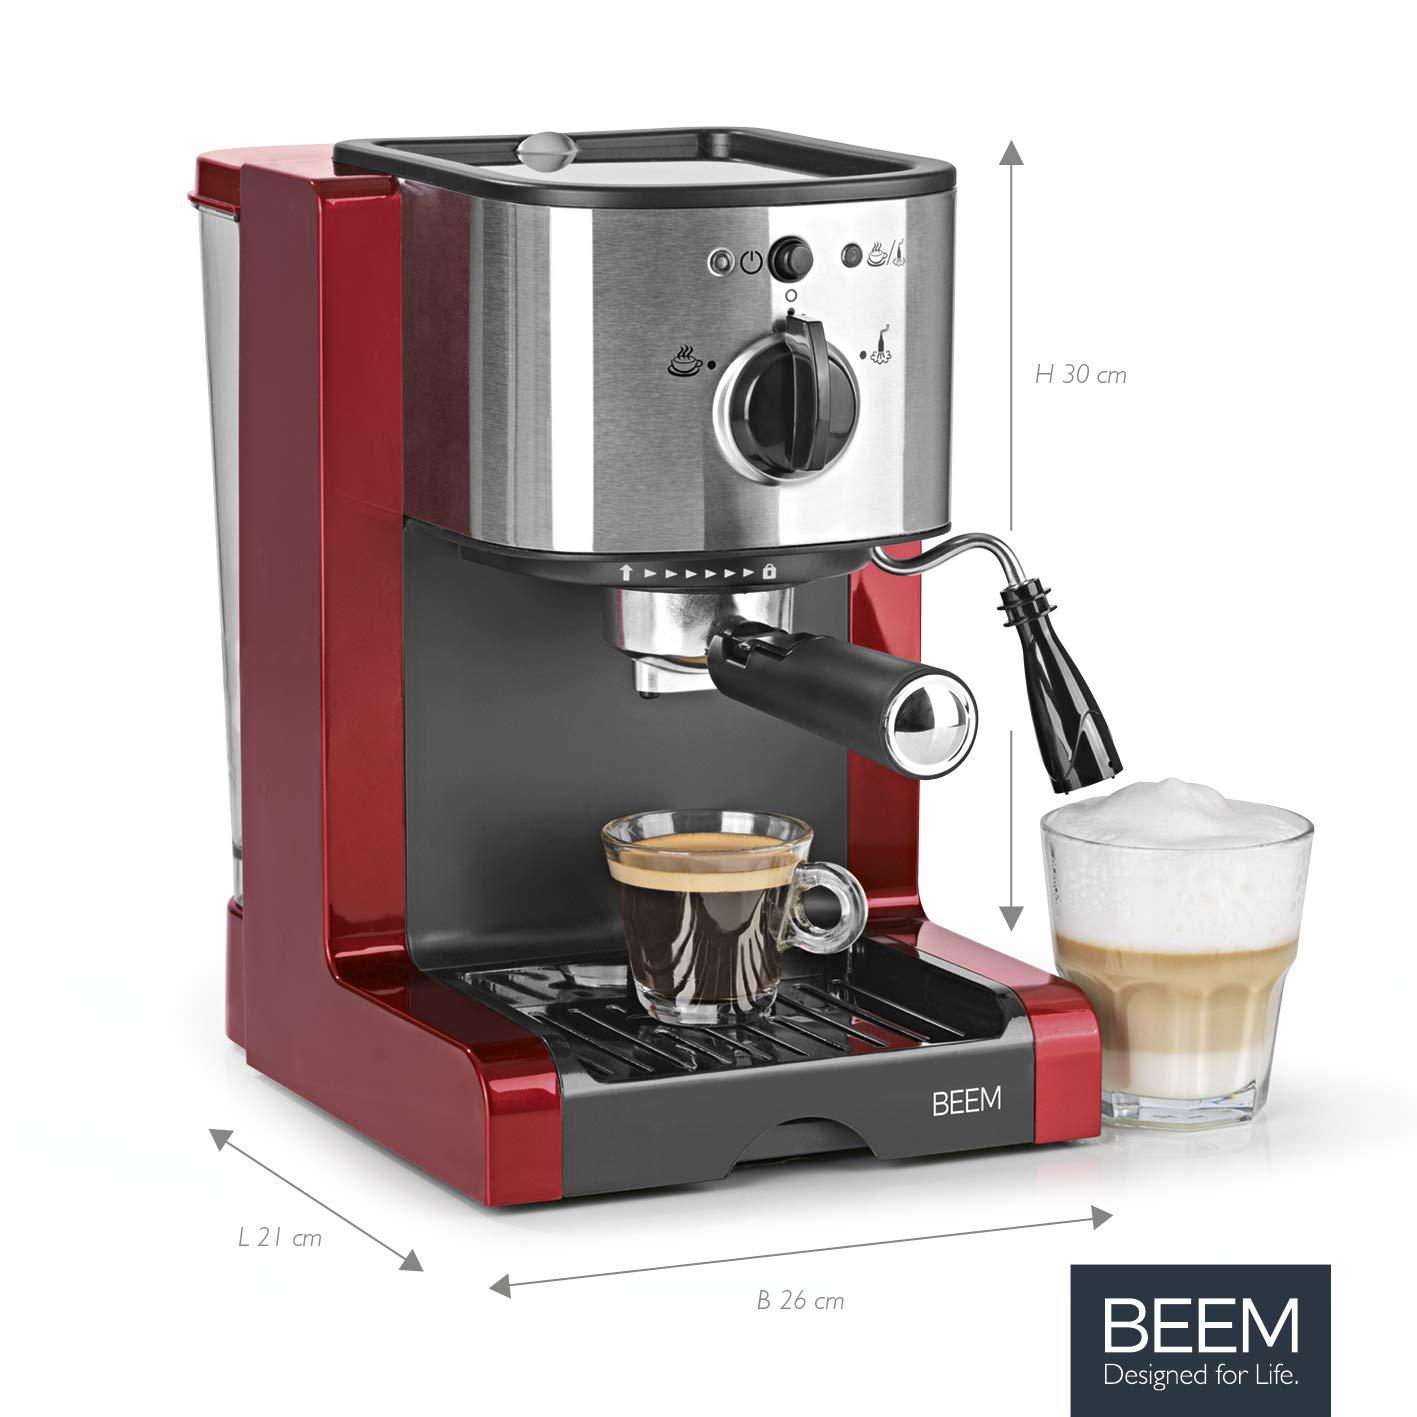 Cafetera Beem 02051 Espresso Perfect | Cafetera expreso para café molido (1350 W, 15 bares) | Expreso, capuchino, Latte Macchiato, crema XXL, café expreso largo | Color rojo metálico: Amazon.es: Hogar